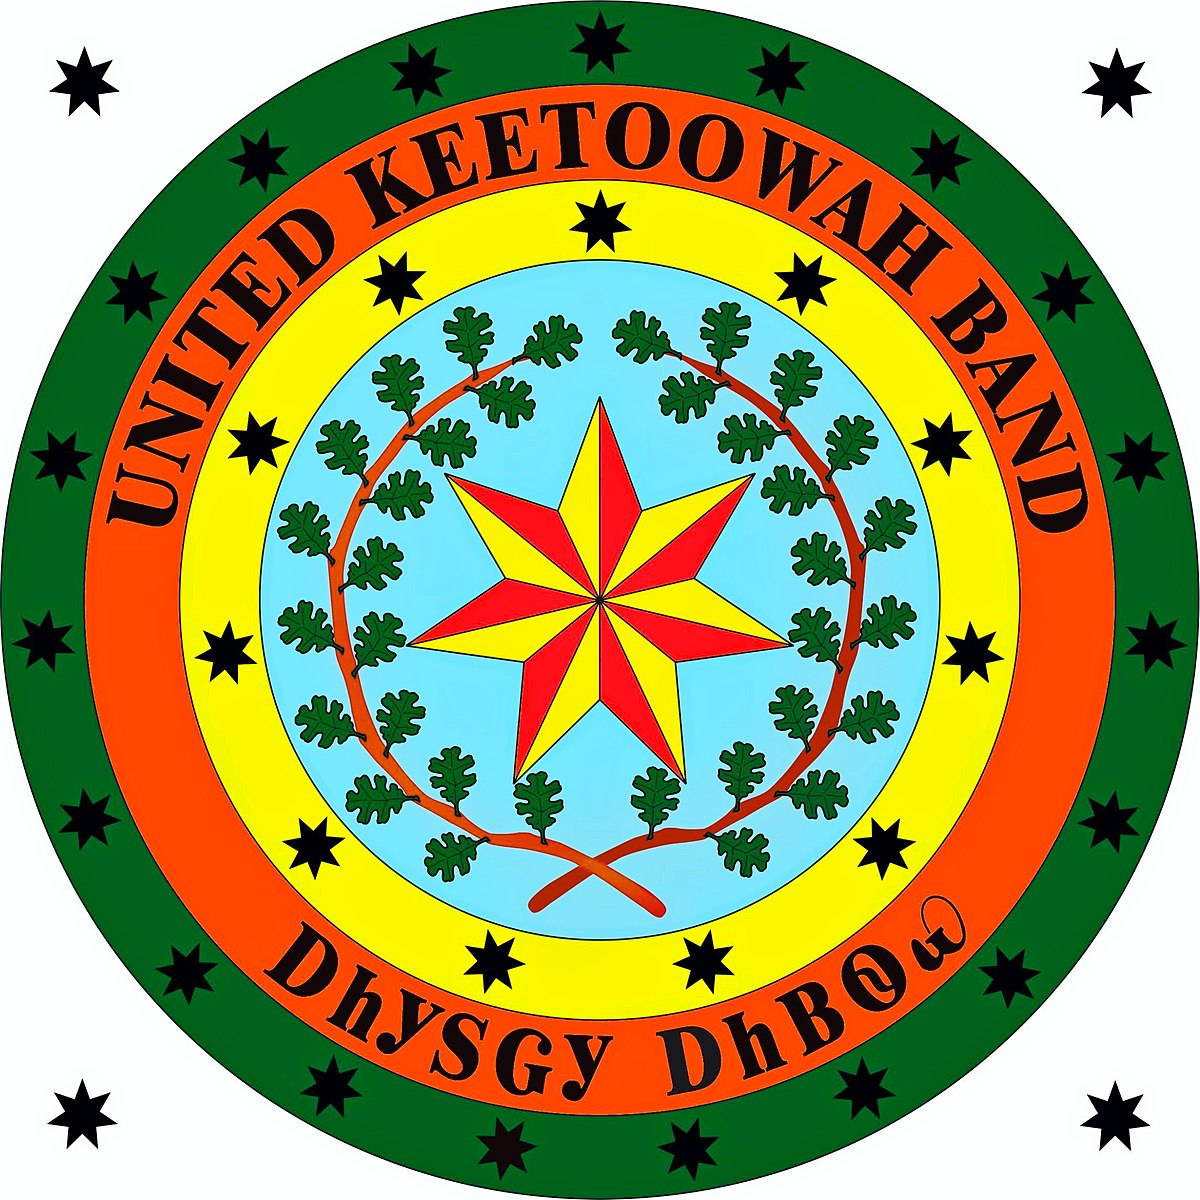 United Keetoowah Band of Cherokee Indians - Wikipedia